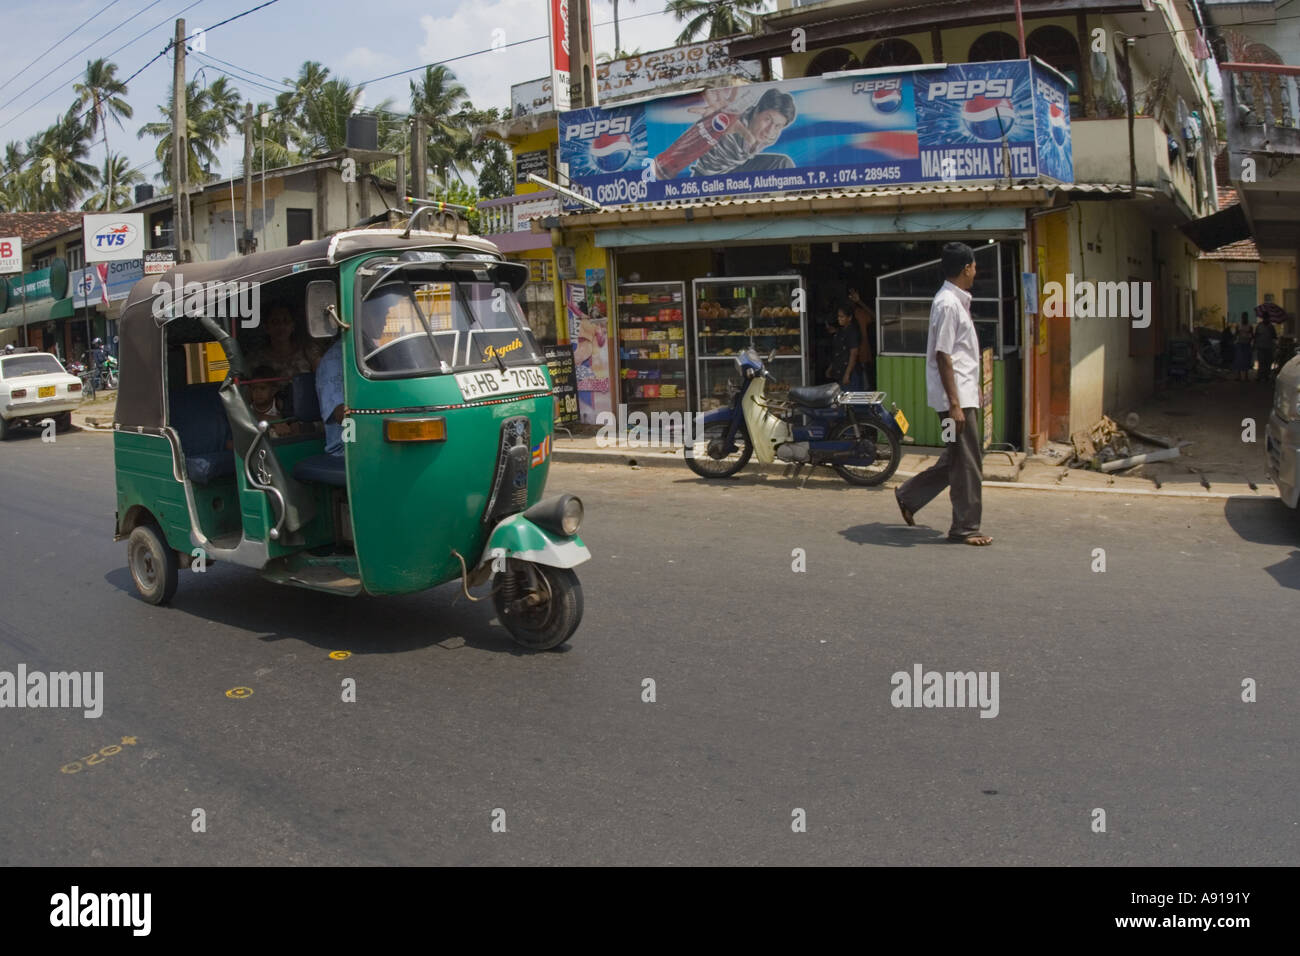 Taxi or tut tut in Bentota Sri lanka - Stock Image